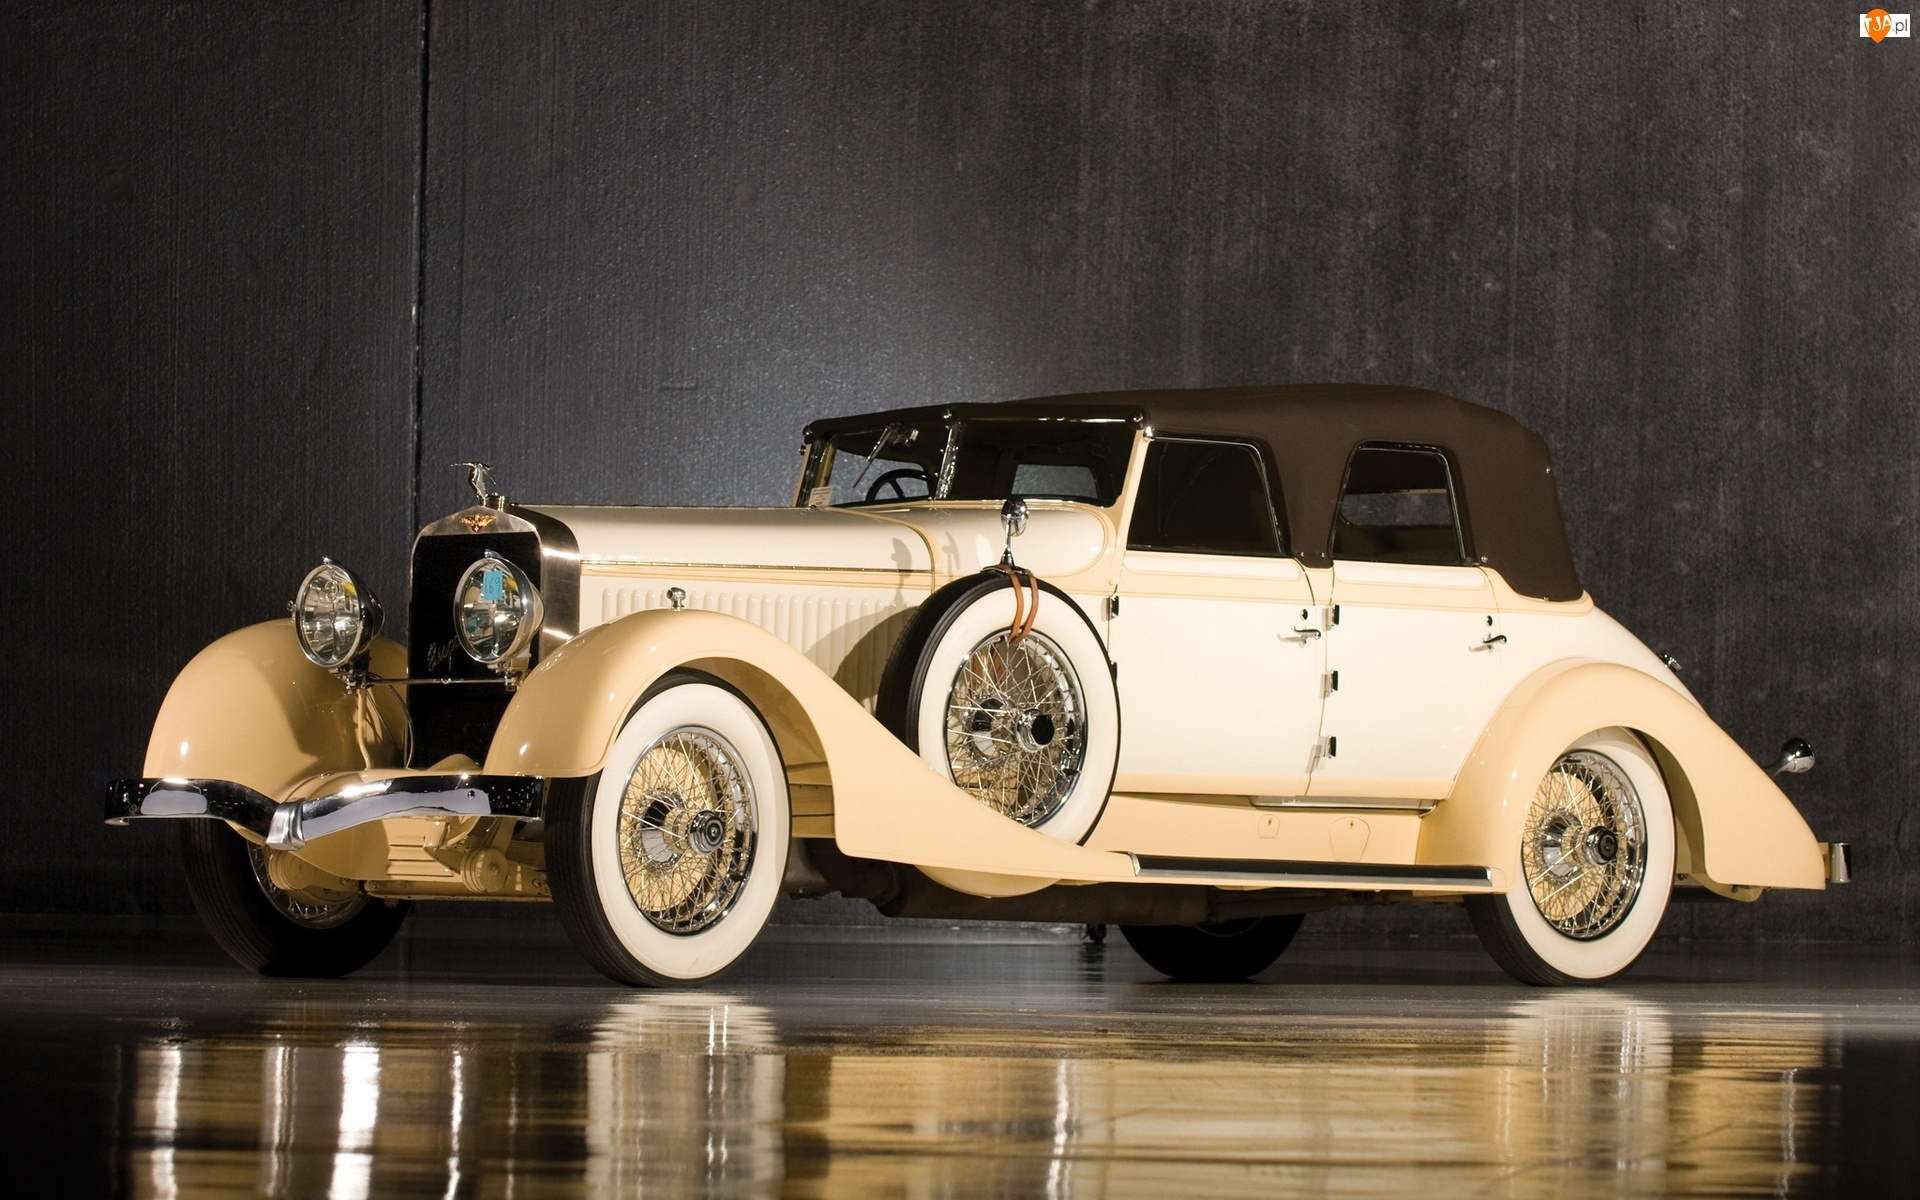 1928, Zabytkowy, Suiza, Hispano, H6c